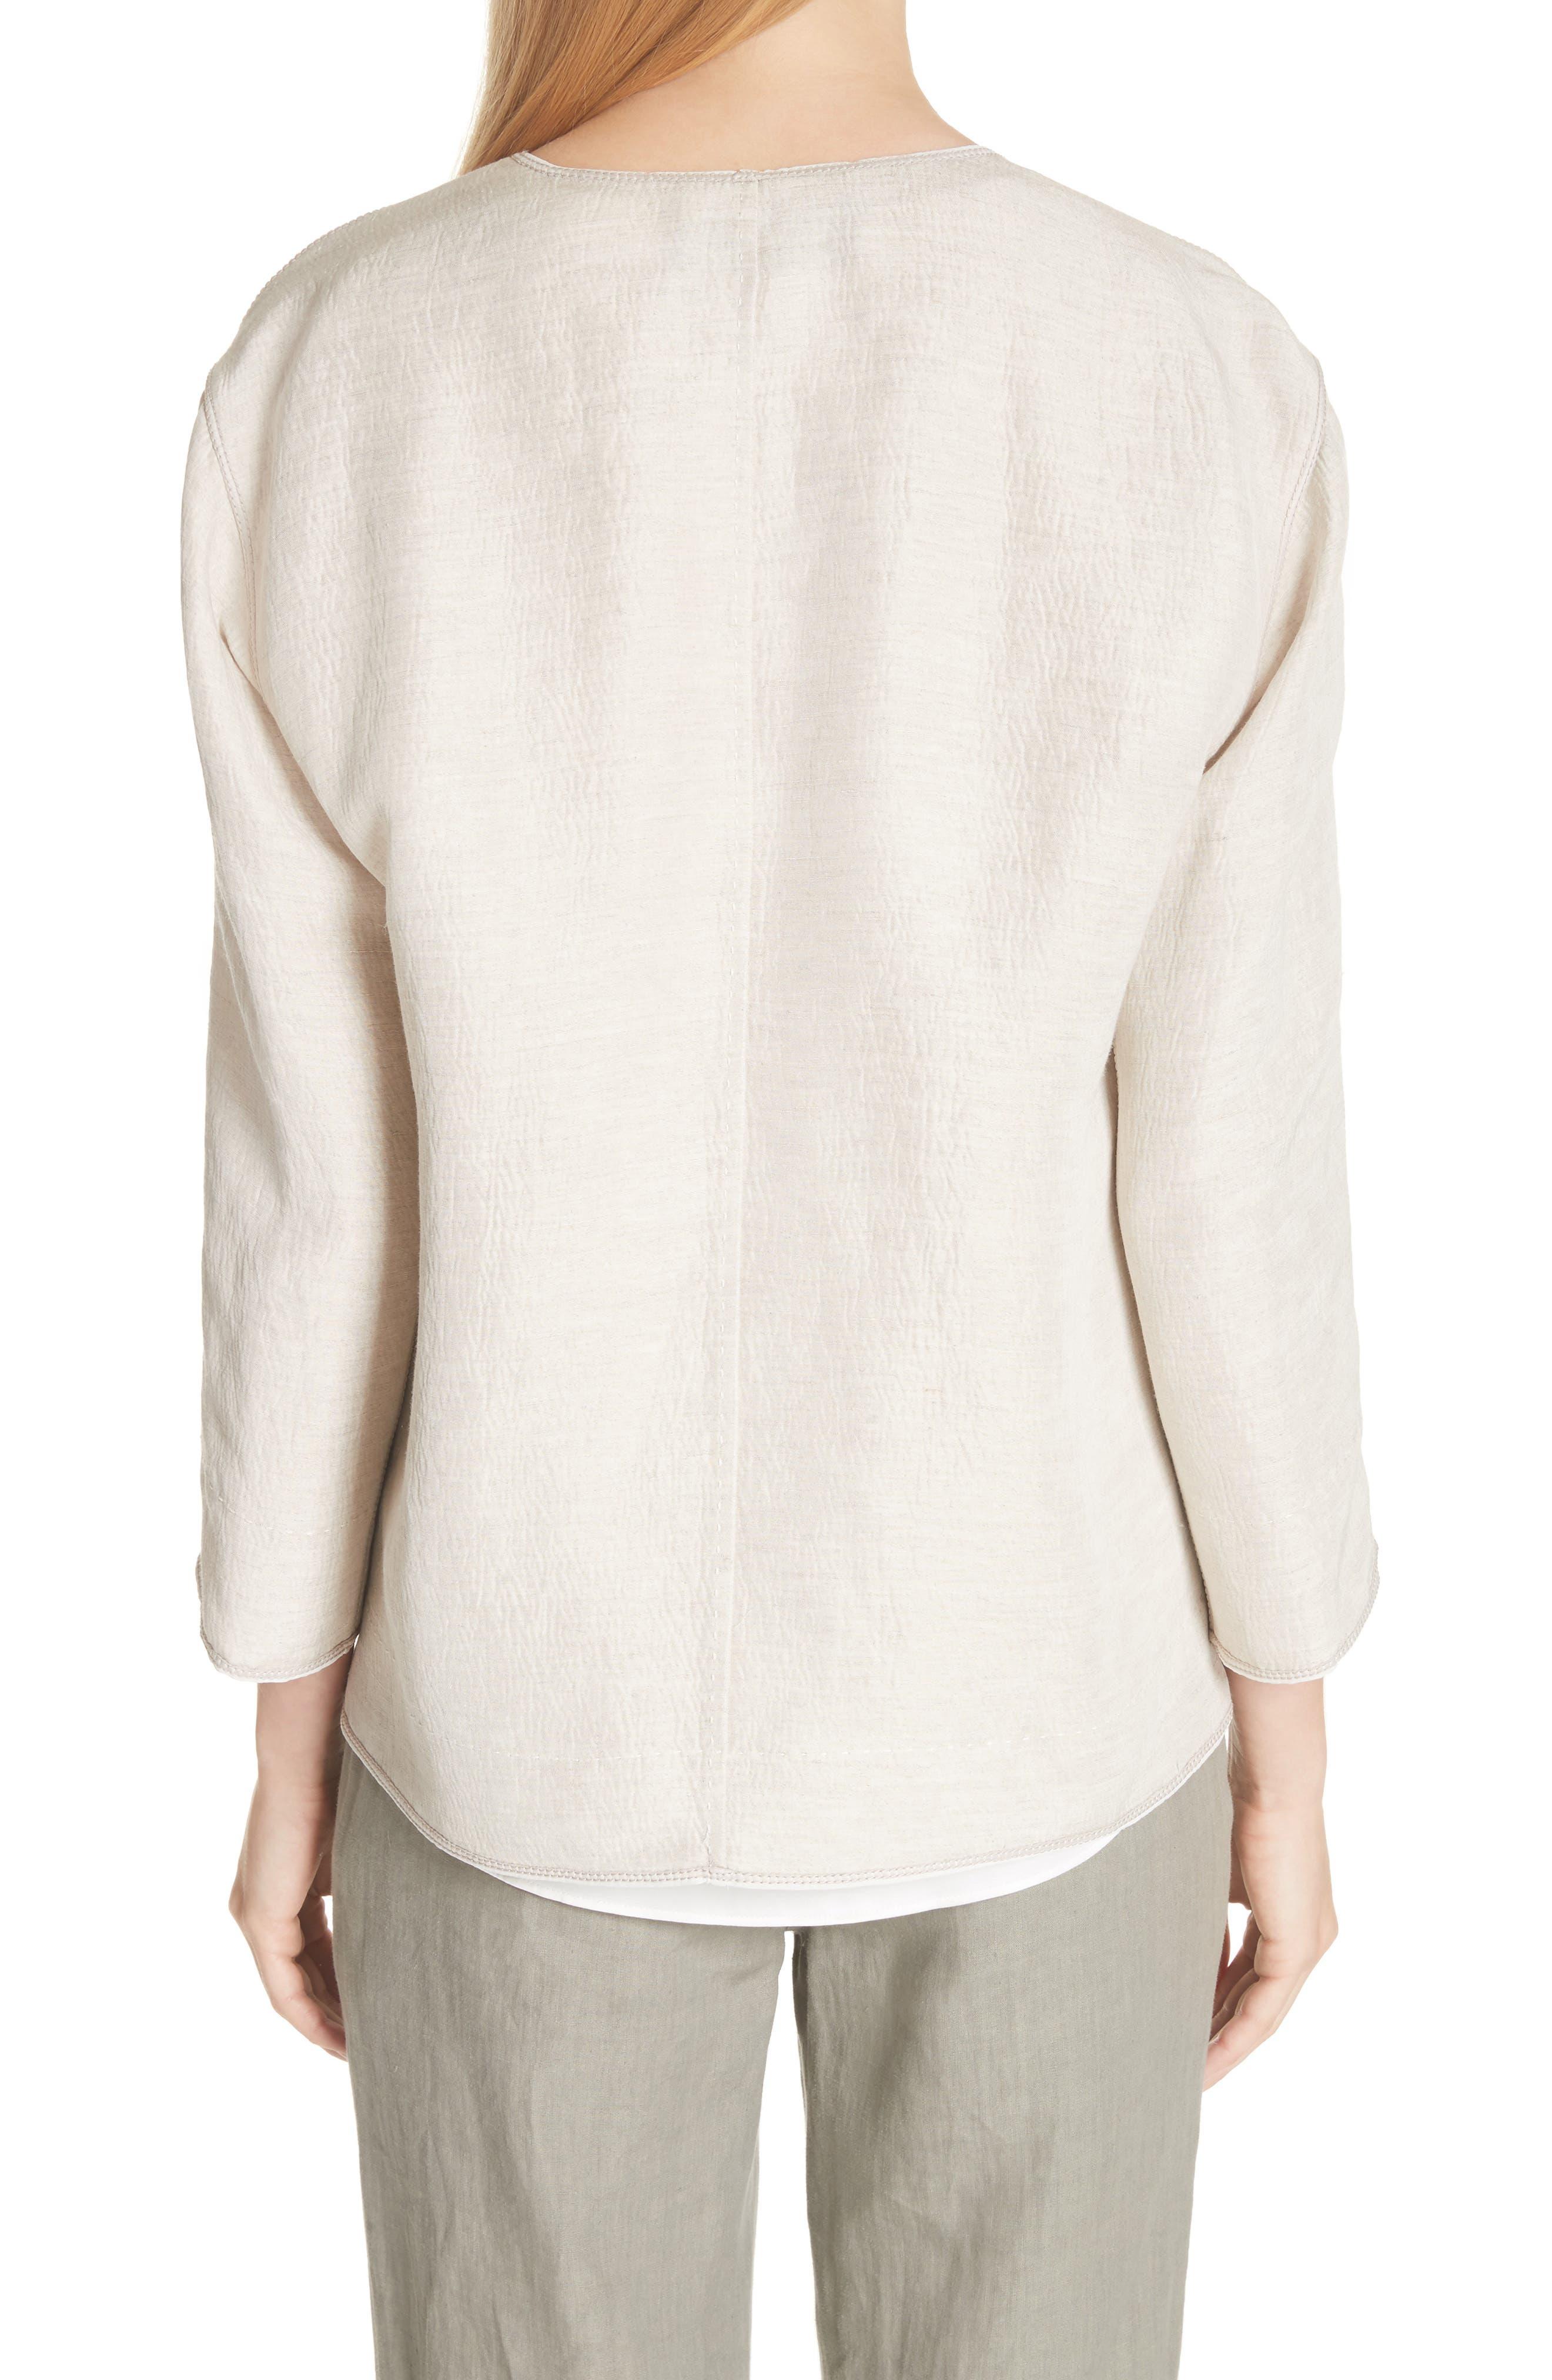 Milo Textured Jacket,                             Alternate thumbnail 2, color,                             Khaki Multi